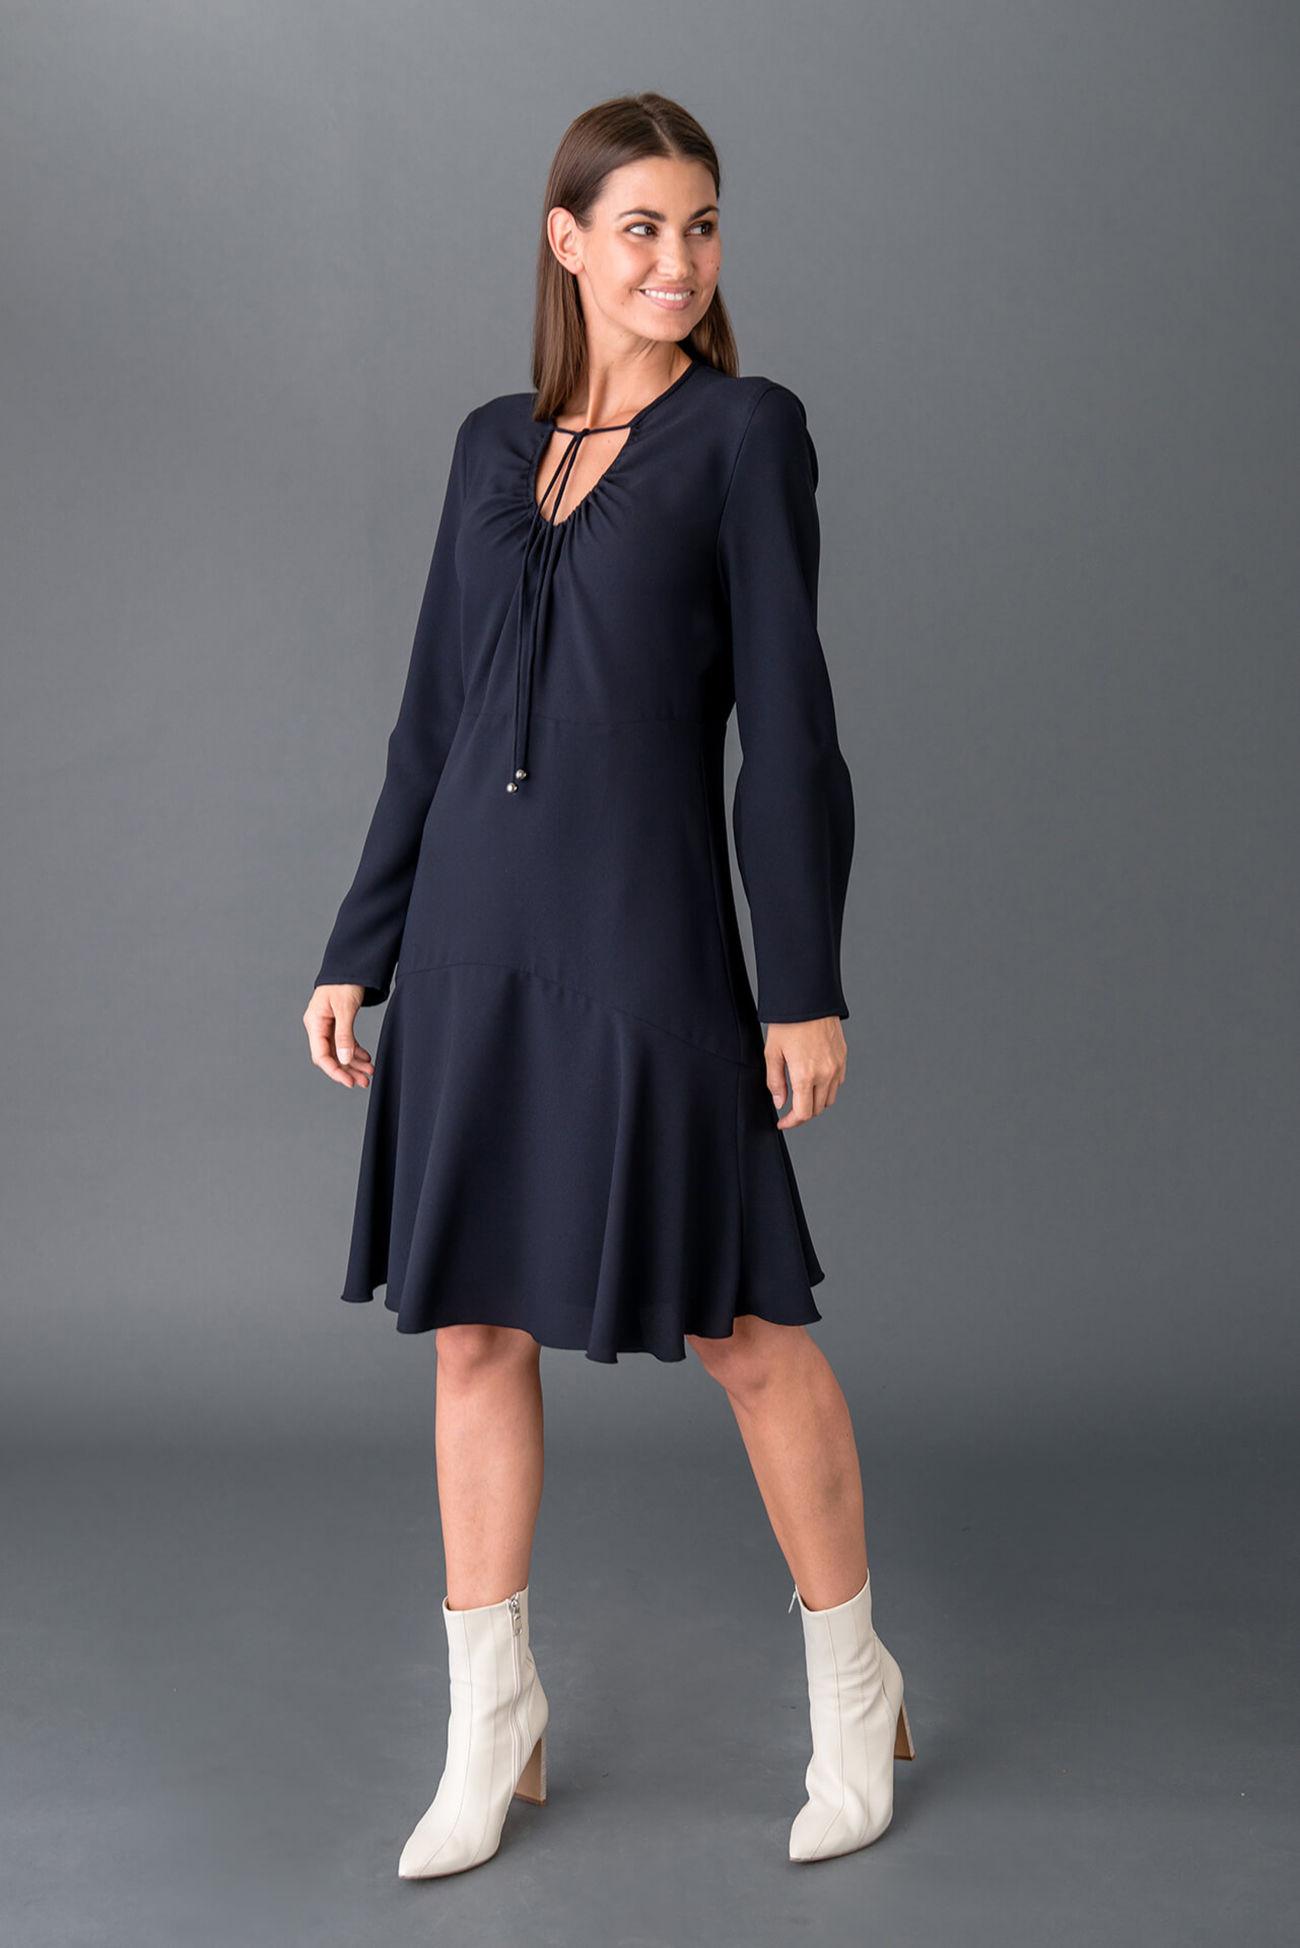 Feminines Kleid aus Travel Sablé